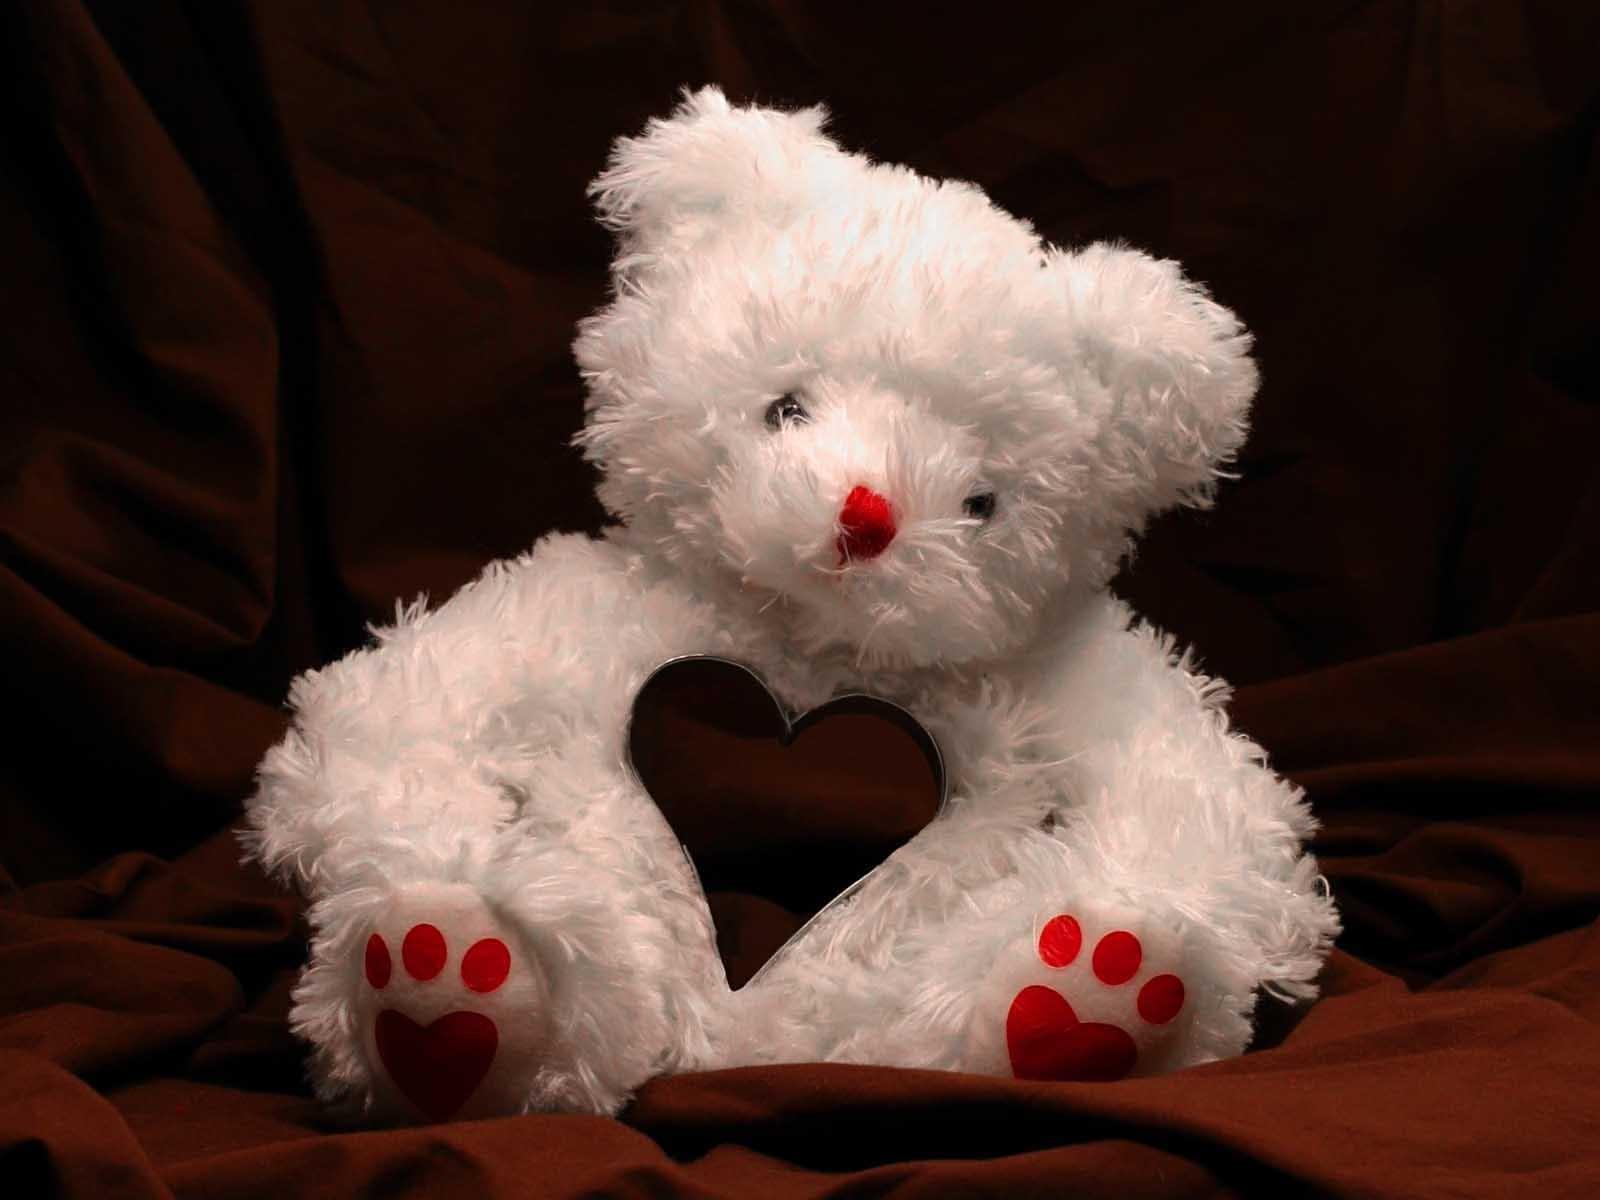 Valentine's teddy bear wallpapers